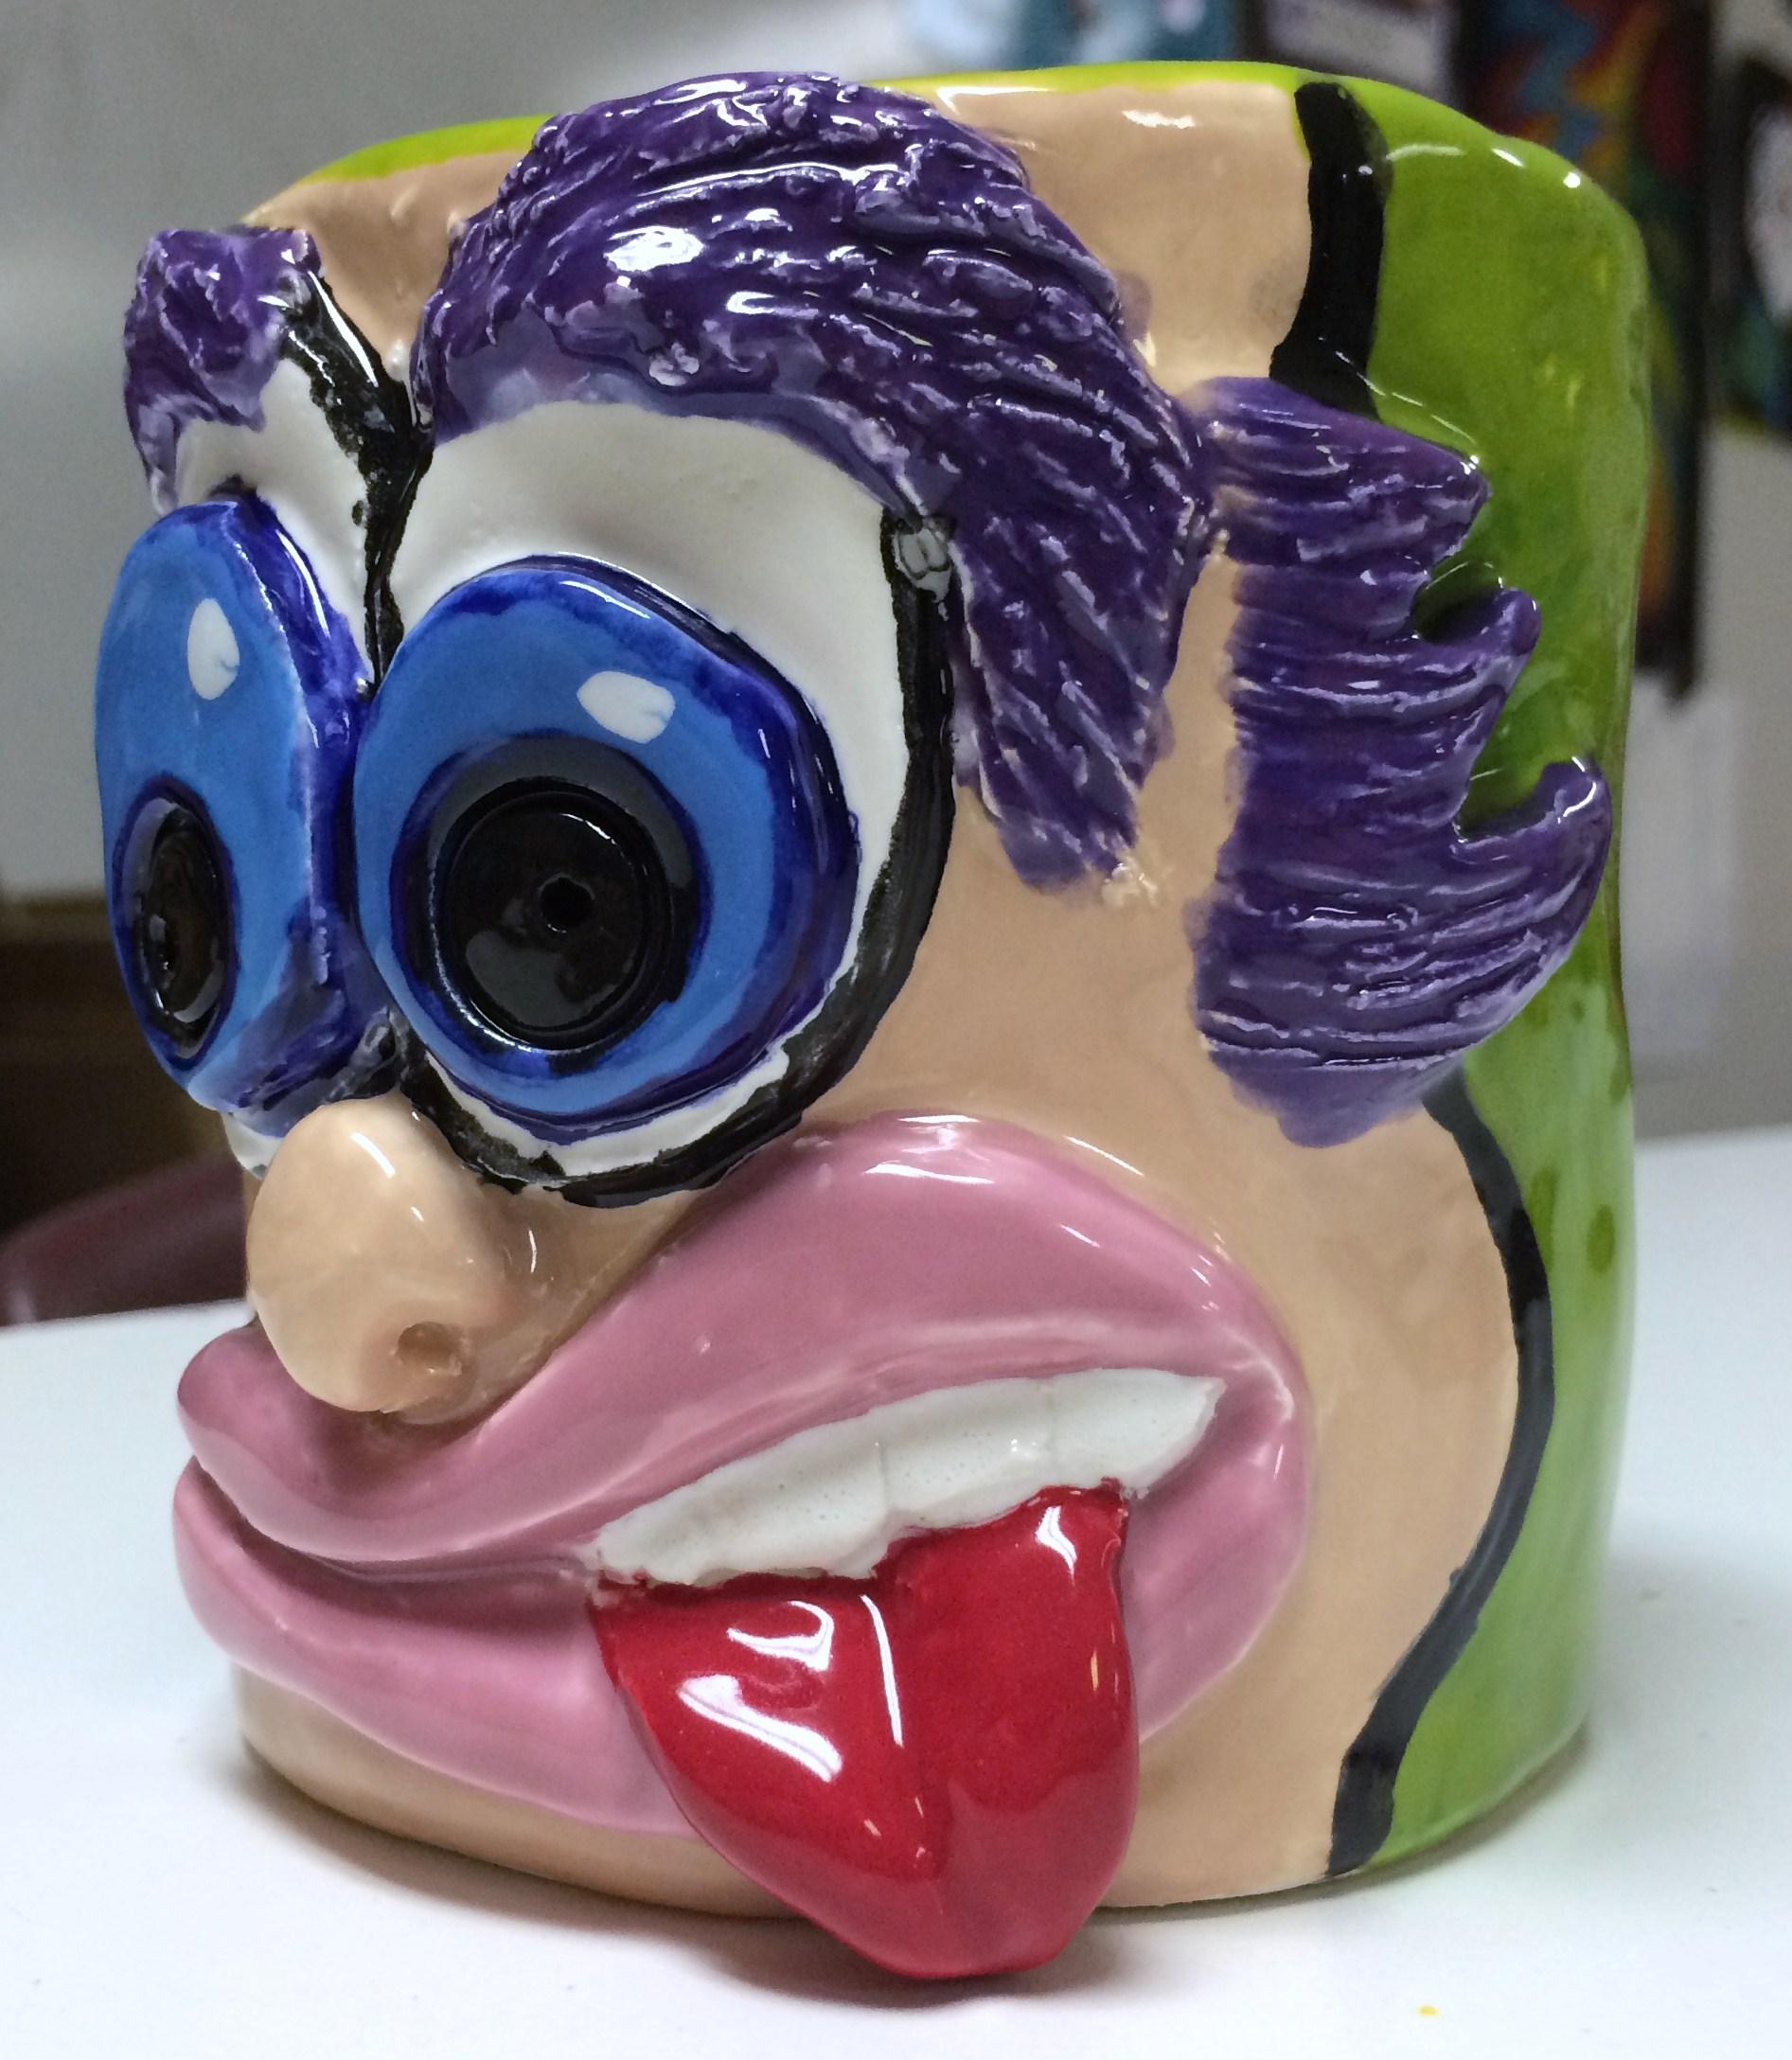 Funny Face Mugs History Of Funny Face Jugs Amp Glazed Mugs